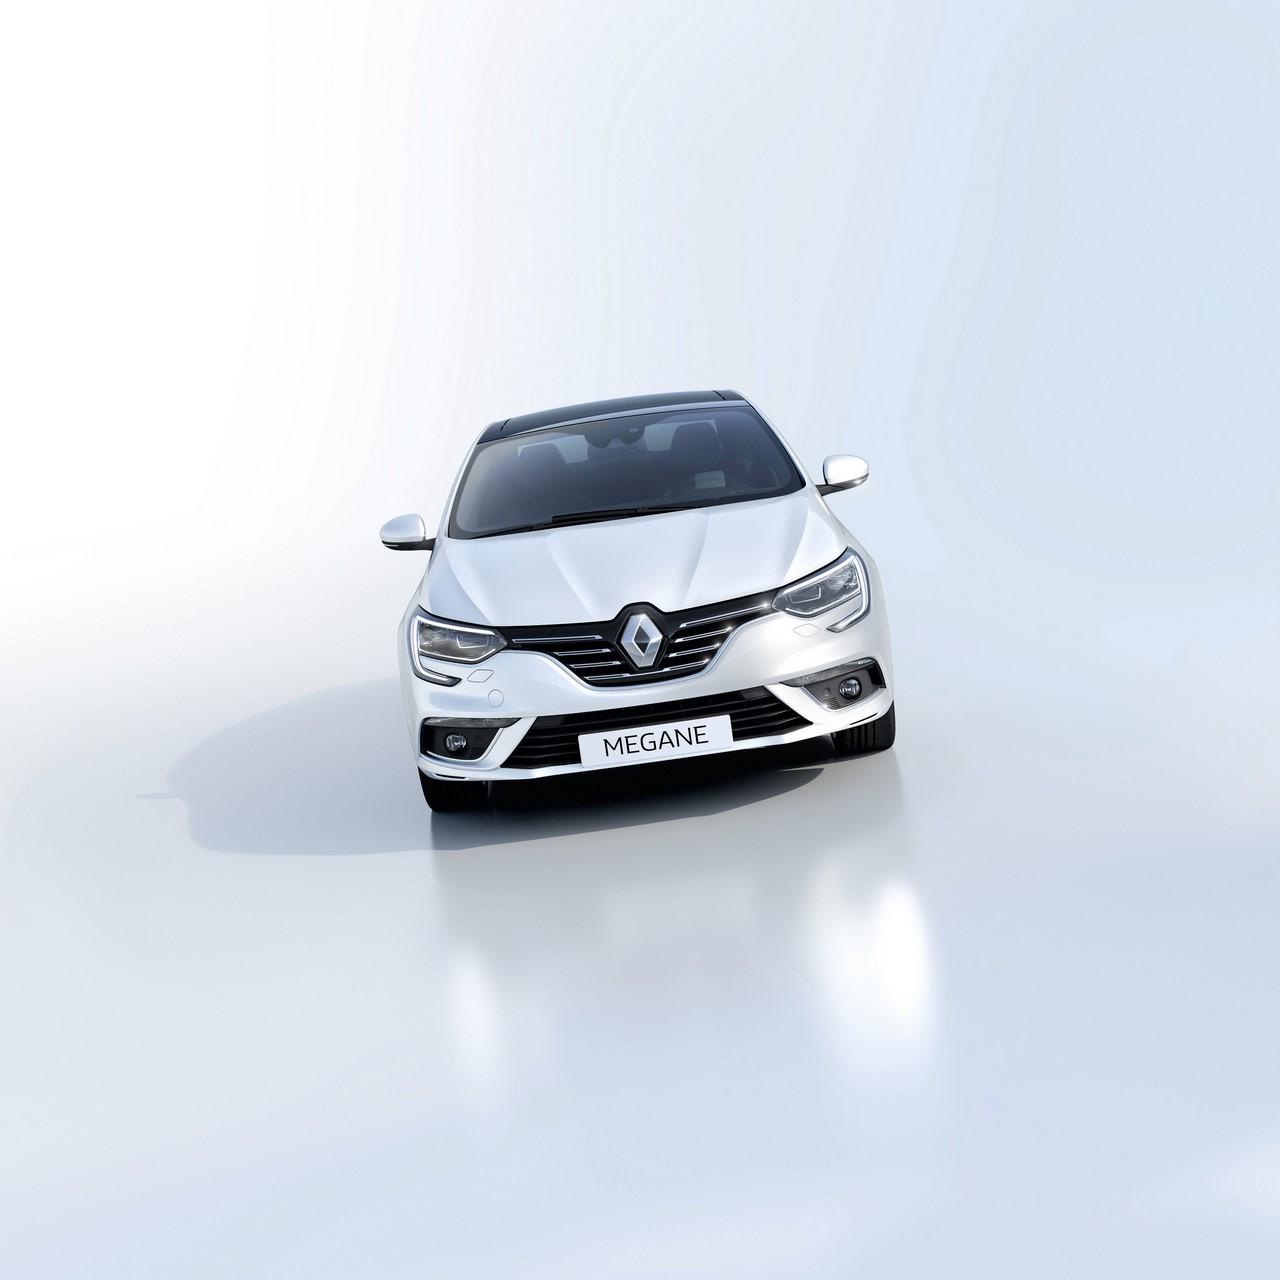 2016 Renault Megane Sedan front studio image